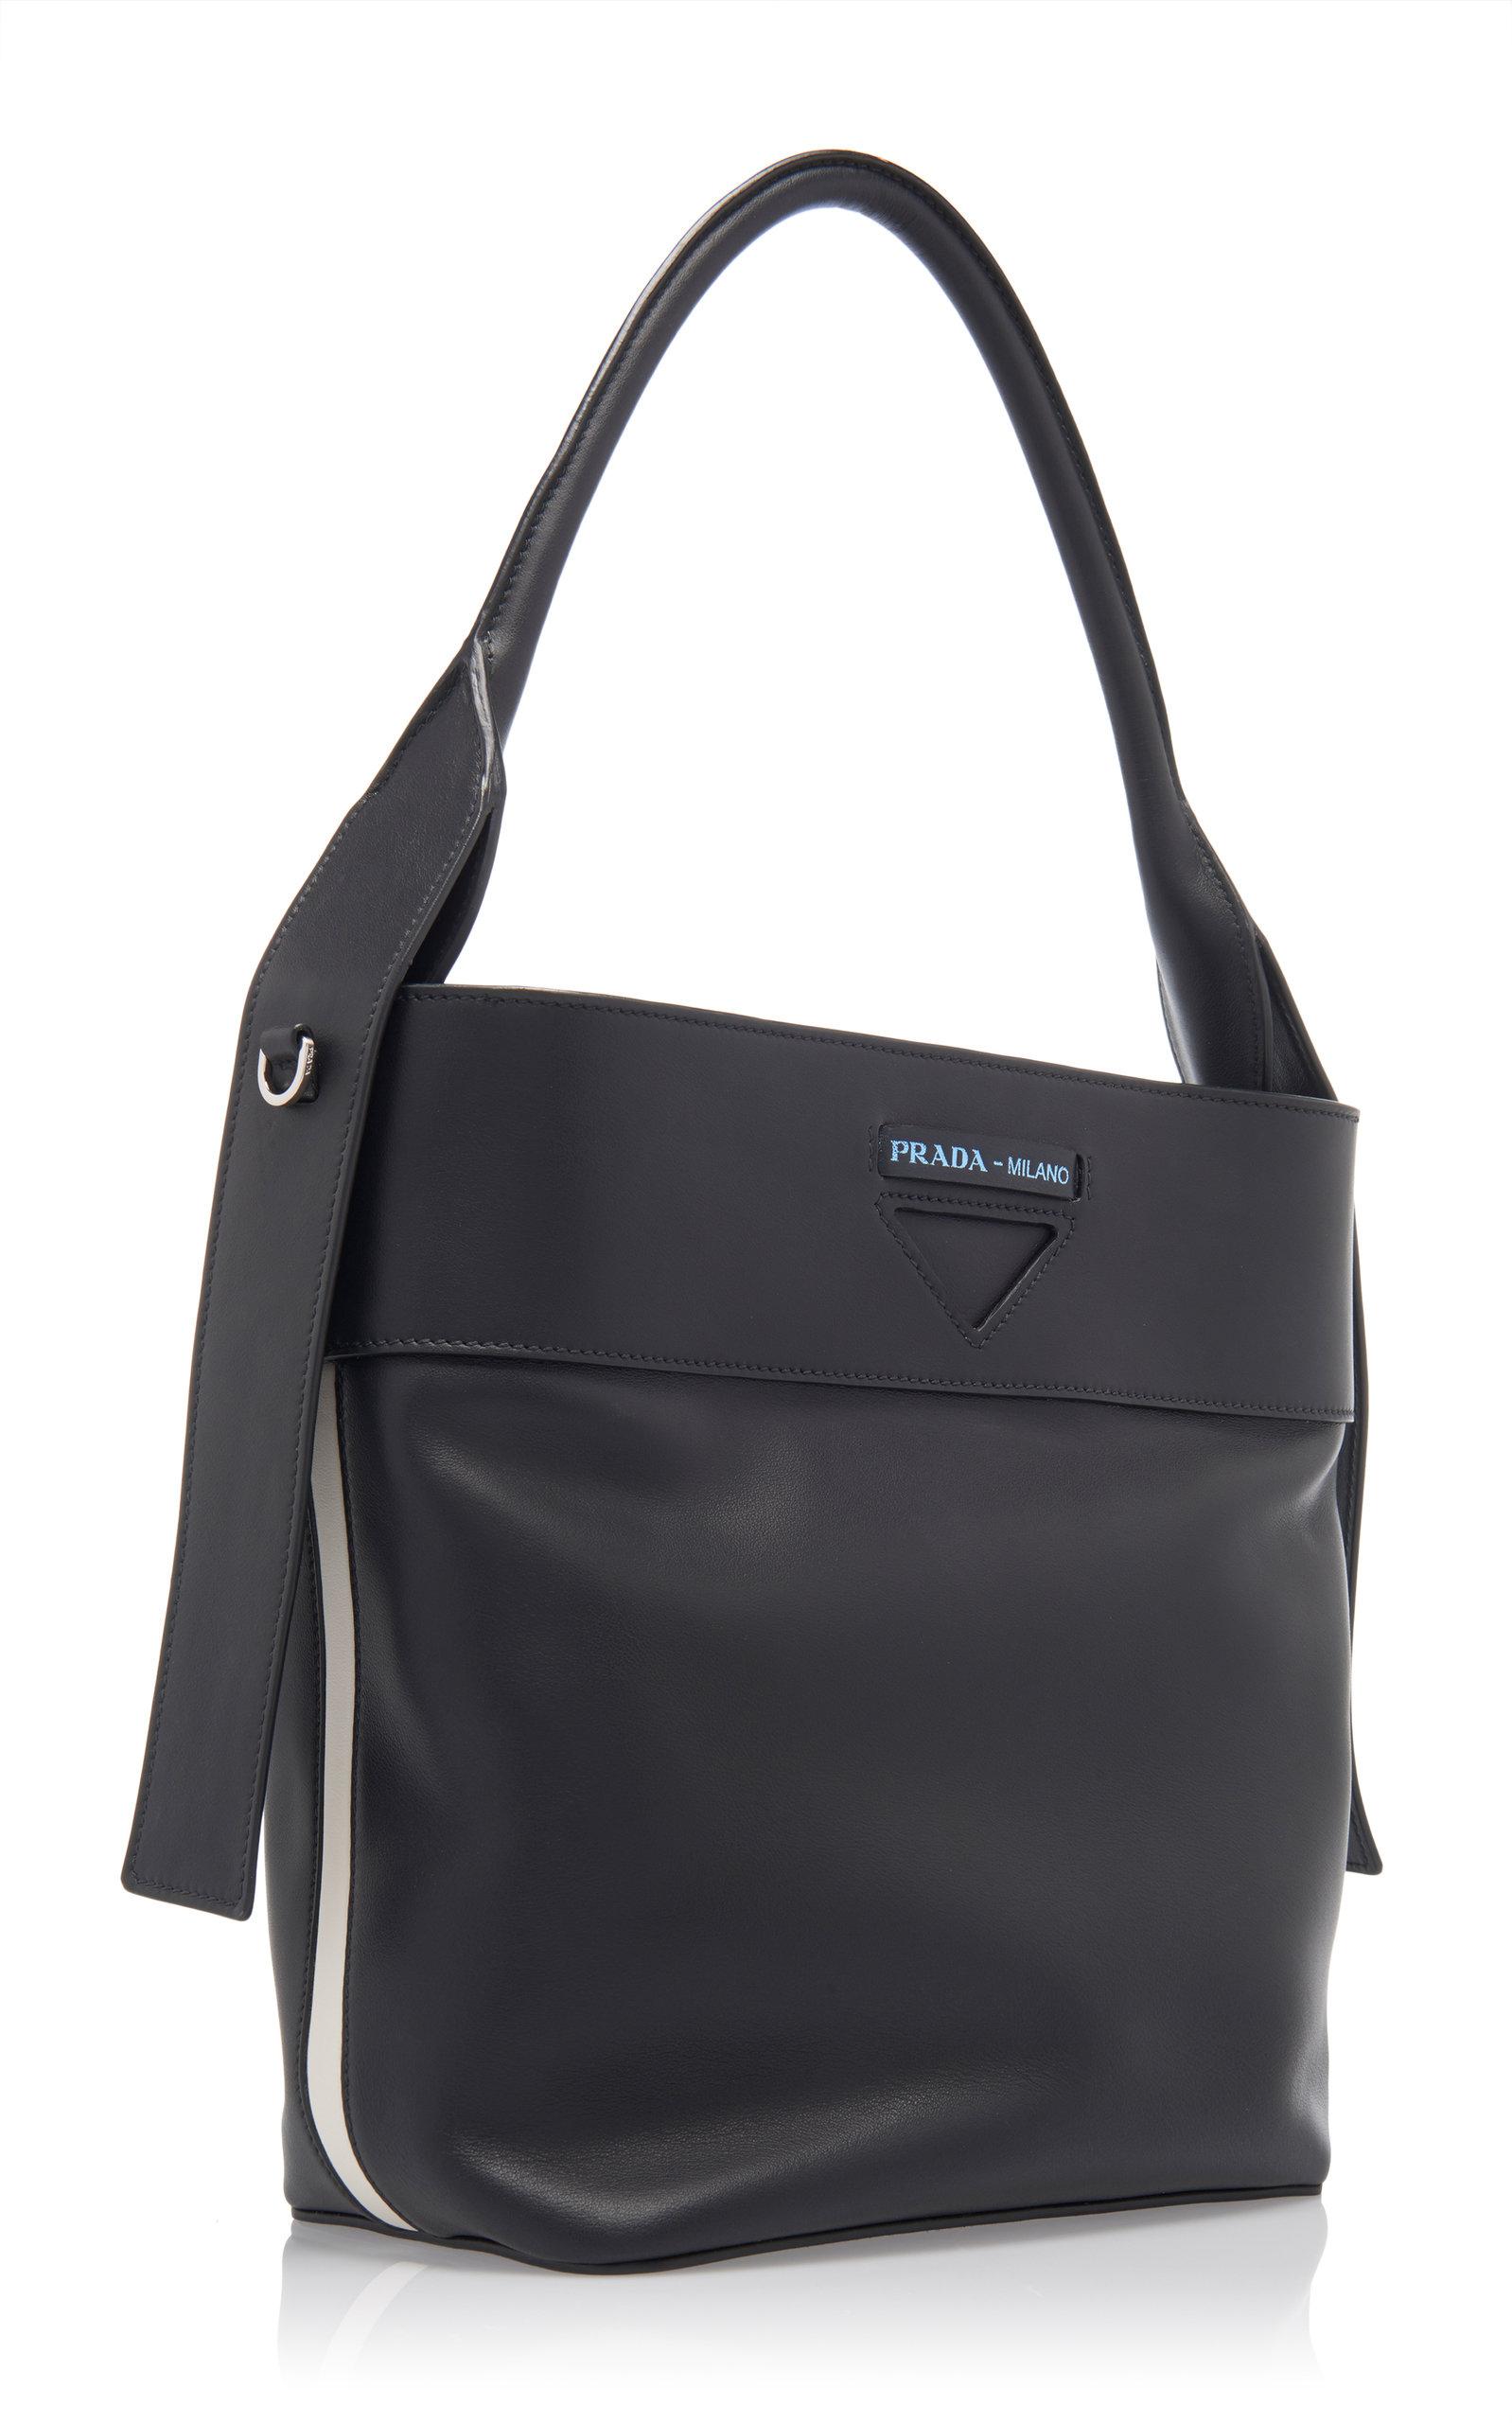 26d4ceea40a1 ... pinterest prada handbags brown and bag f8acf 4b27f; coupon code slouchy  hobo tote by prada moda operandi 6085d b5824